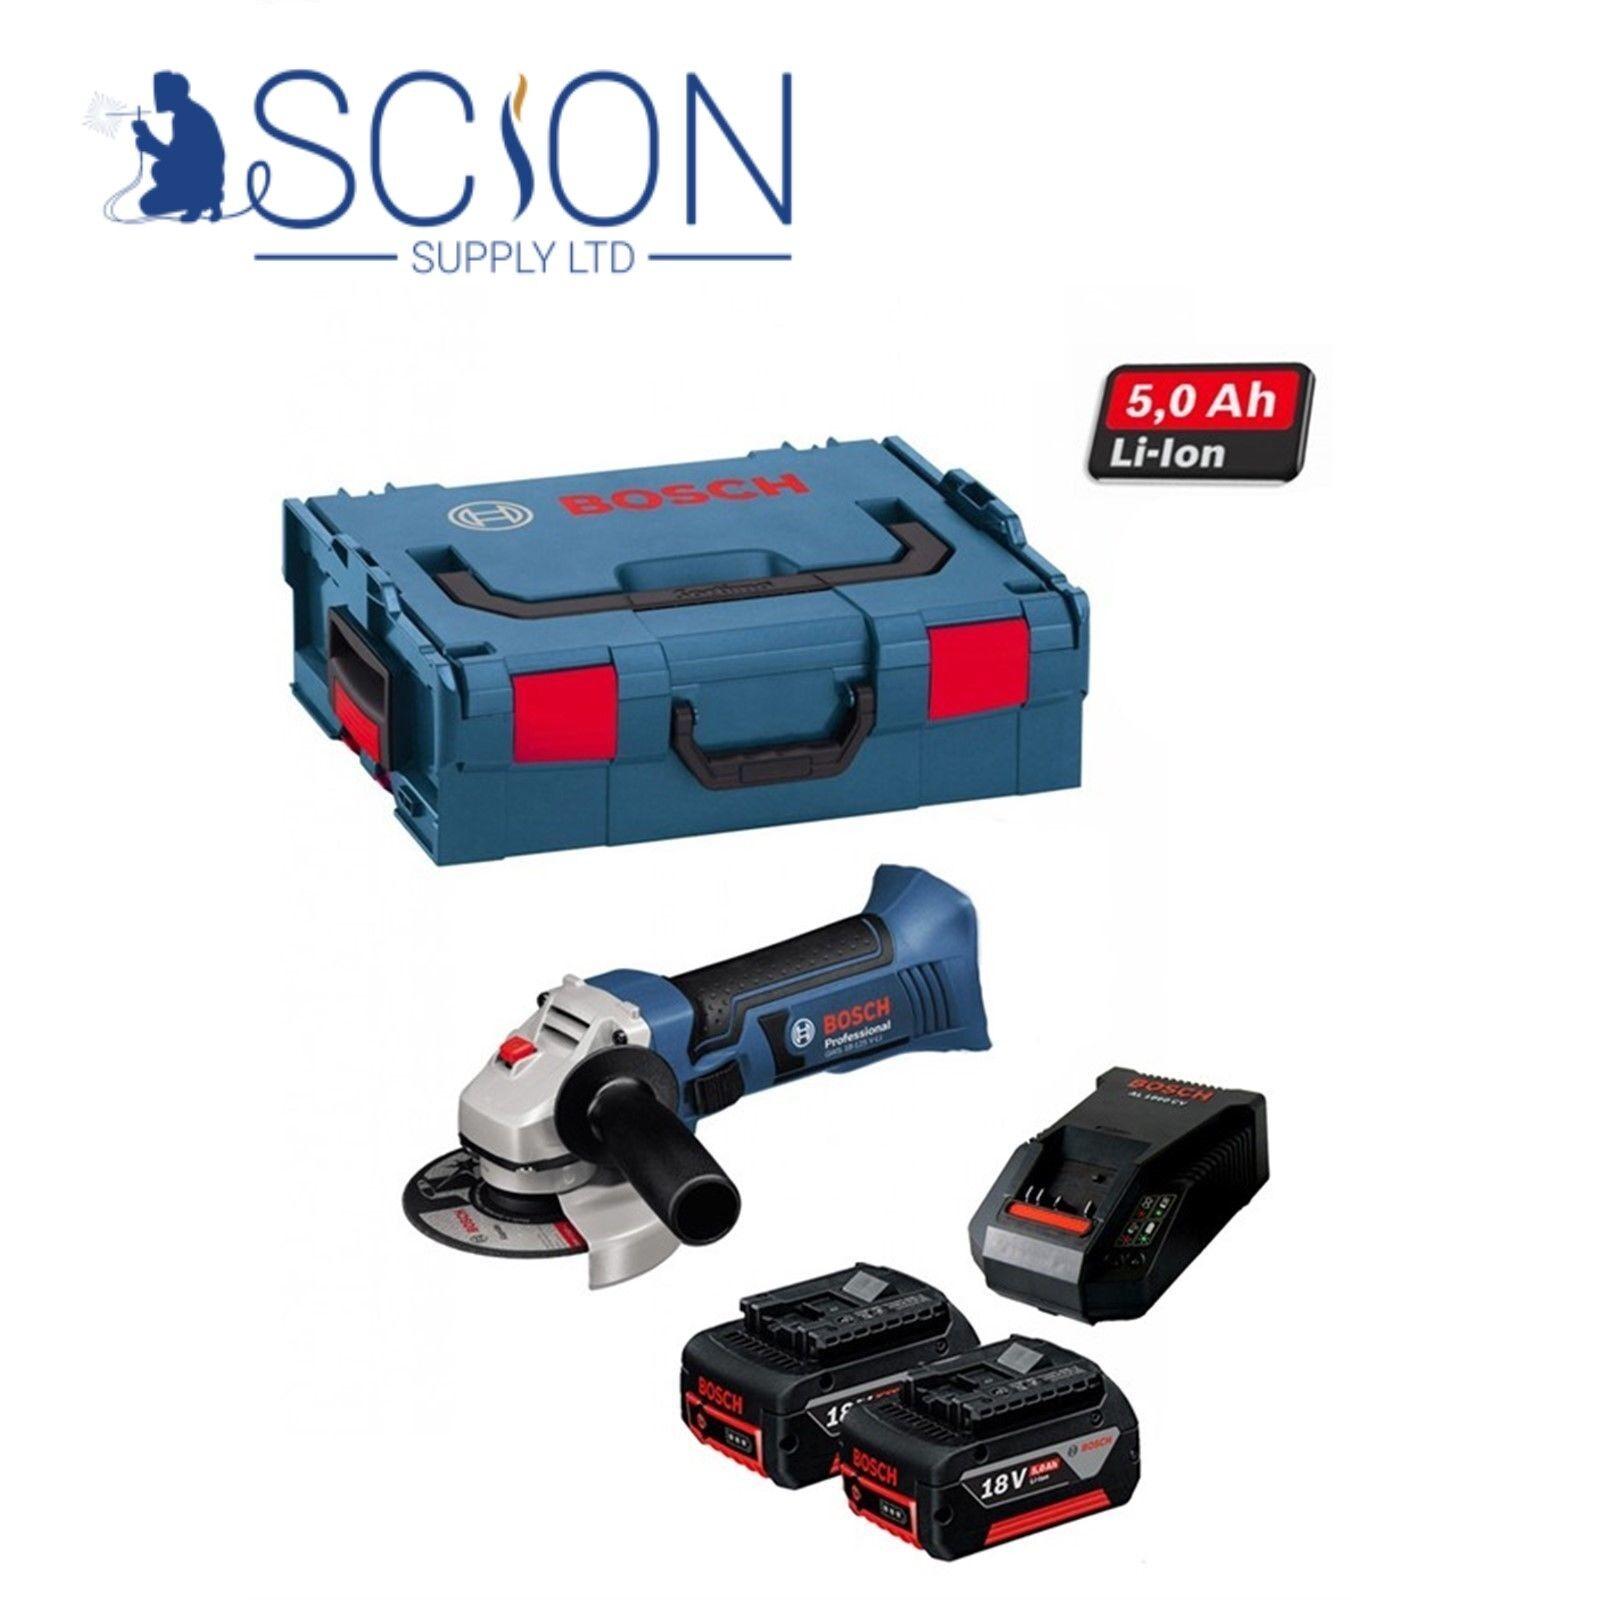 Bosch GWS18VLI 18v 115mm Angle Grinder Lithium-Ion c w 2 x 5.0Ah Batteries &Case